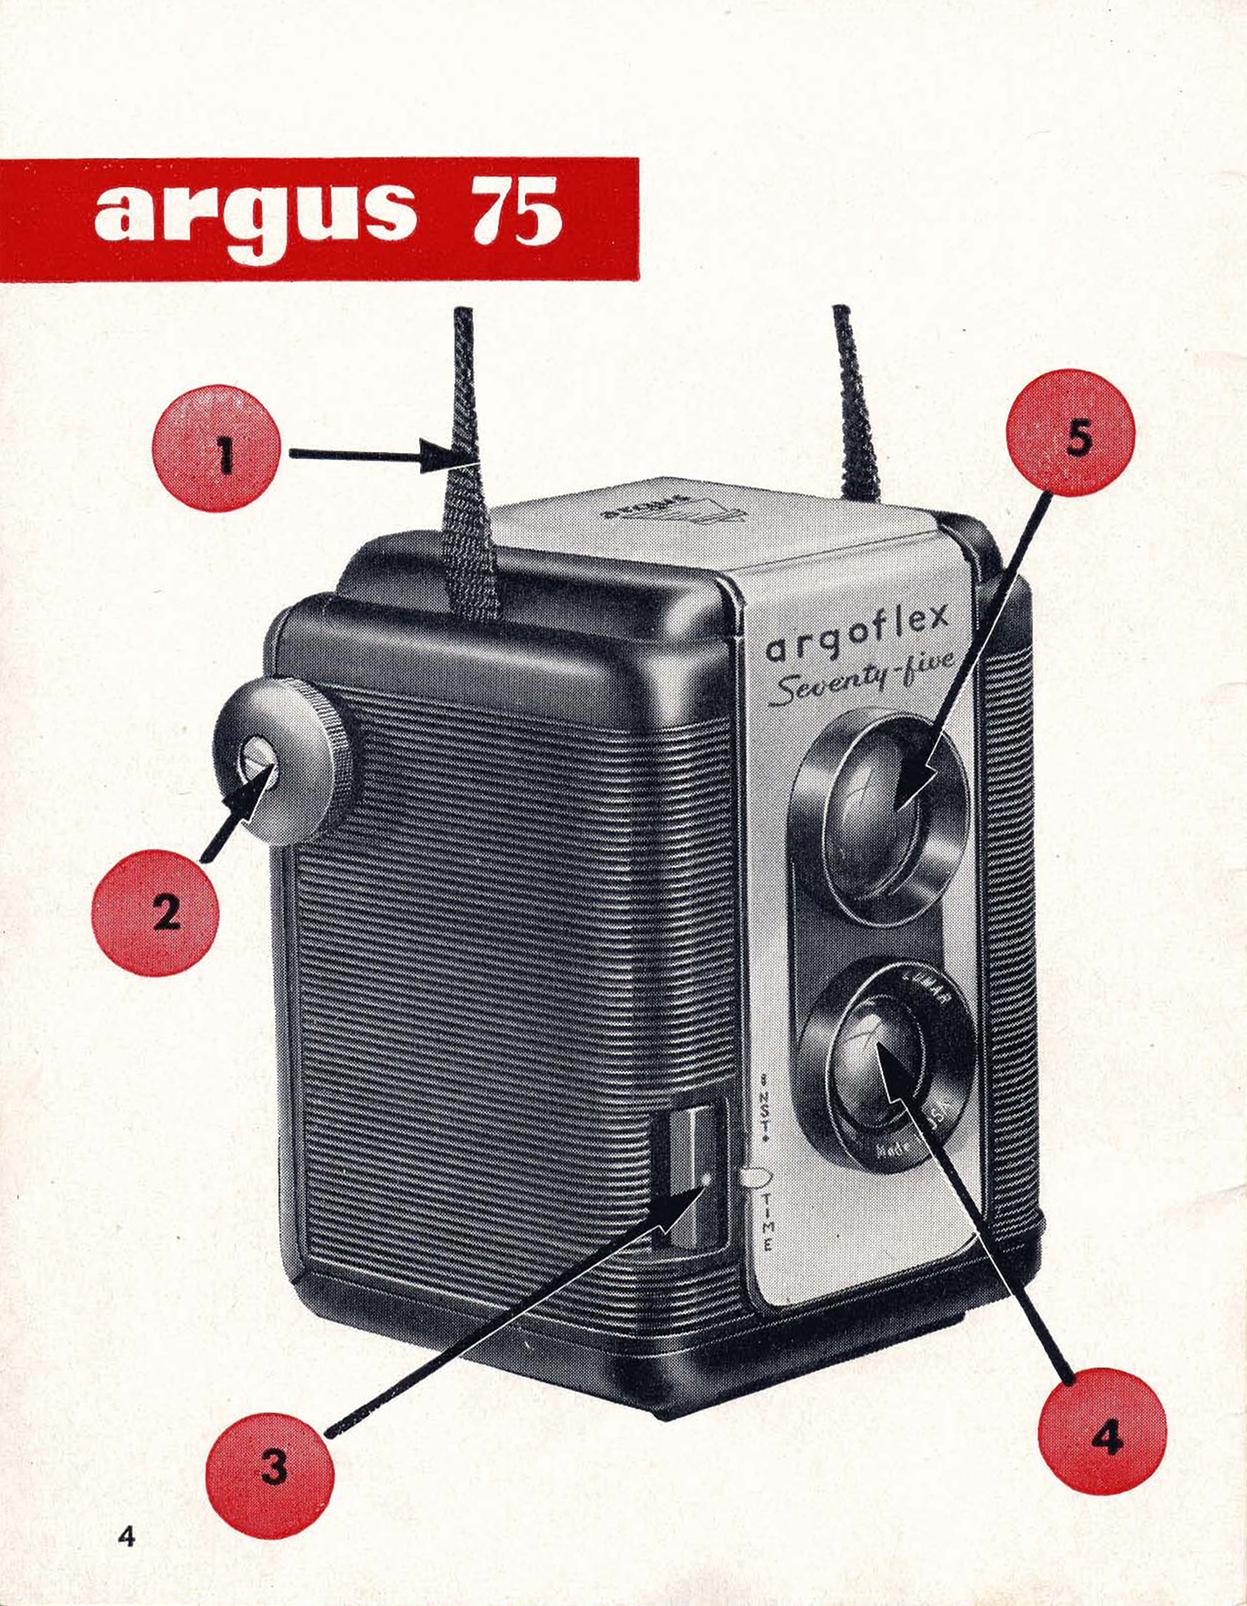 argus 75 instructions for use ann arbor district library rh aadl org Argus Percy Jackson Argus the Unmaker